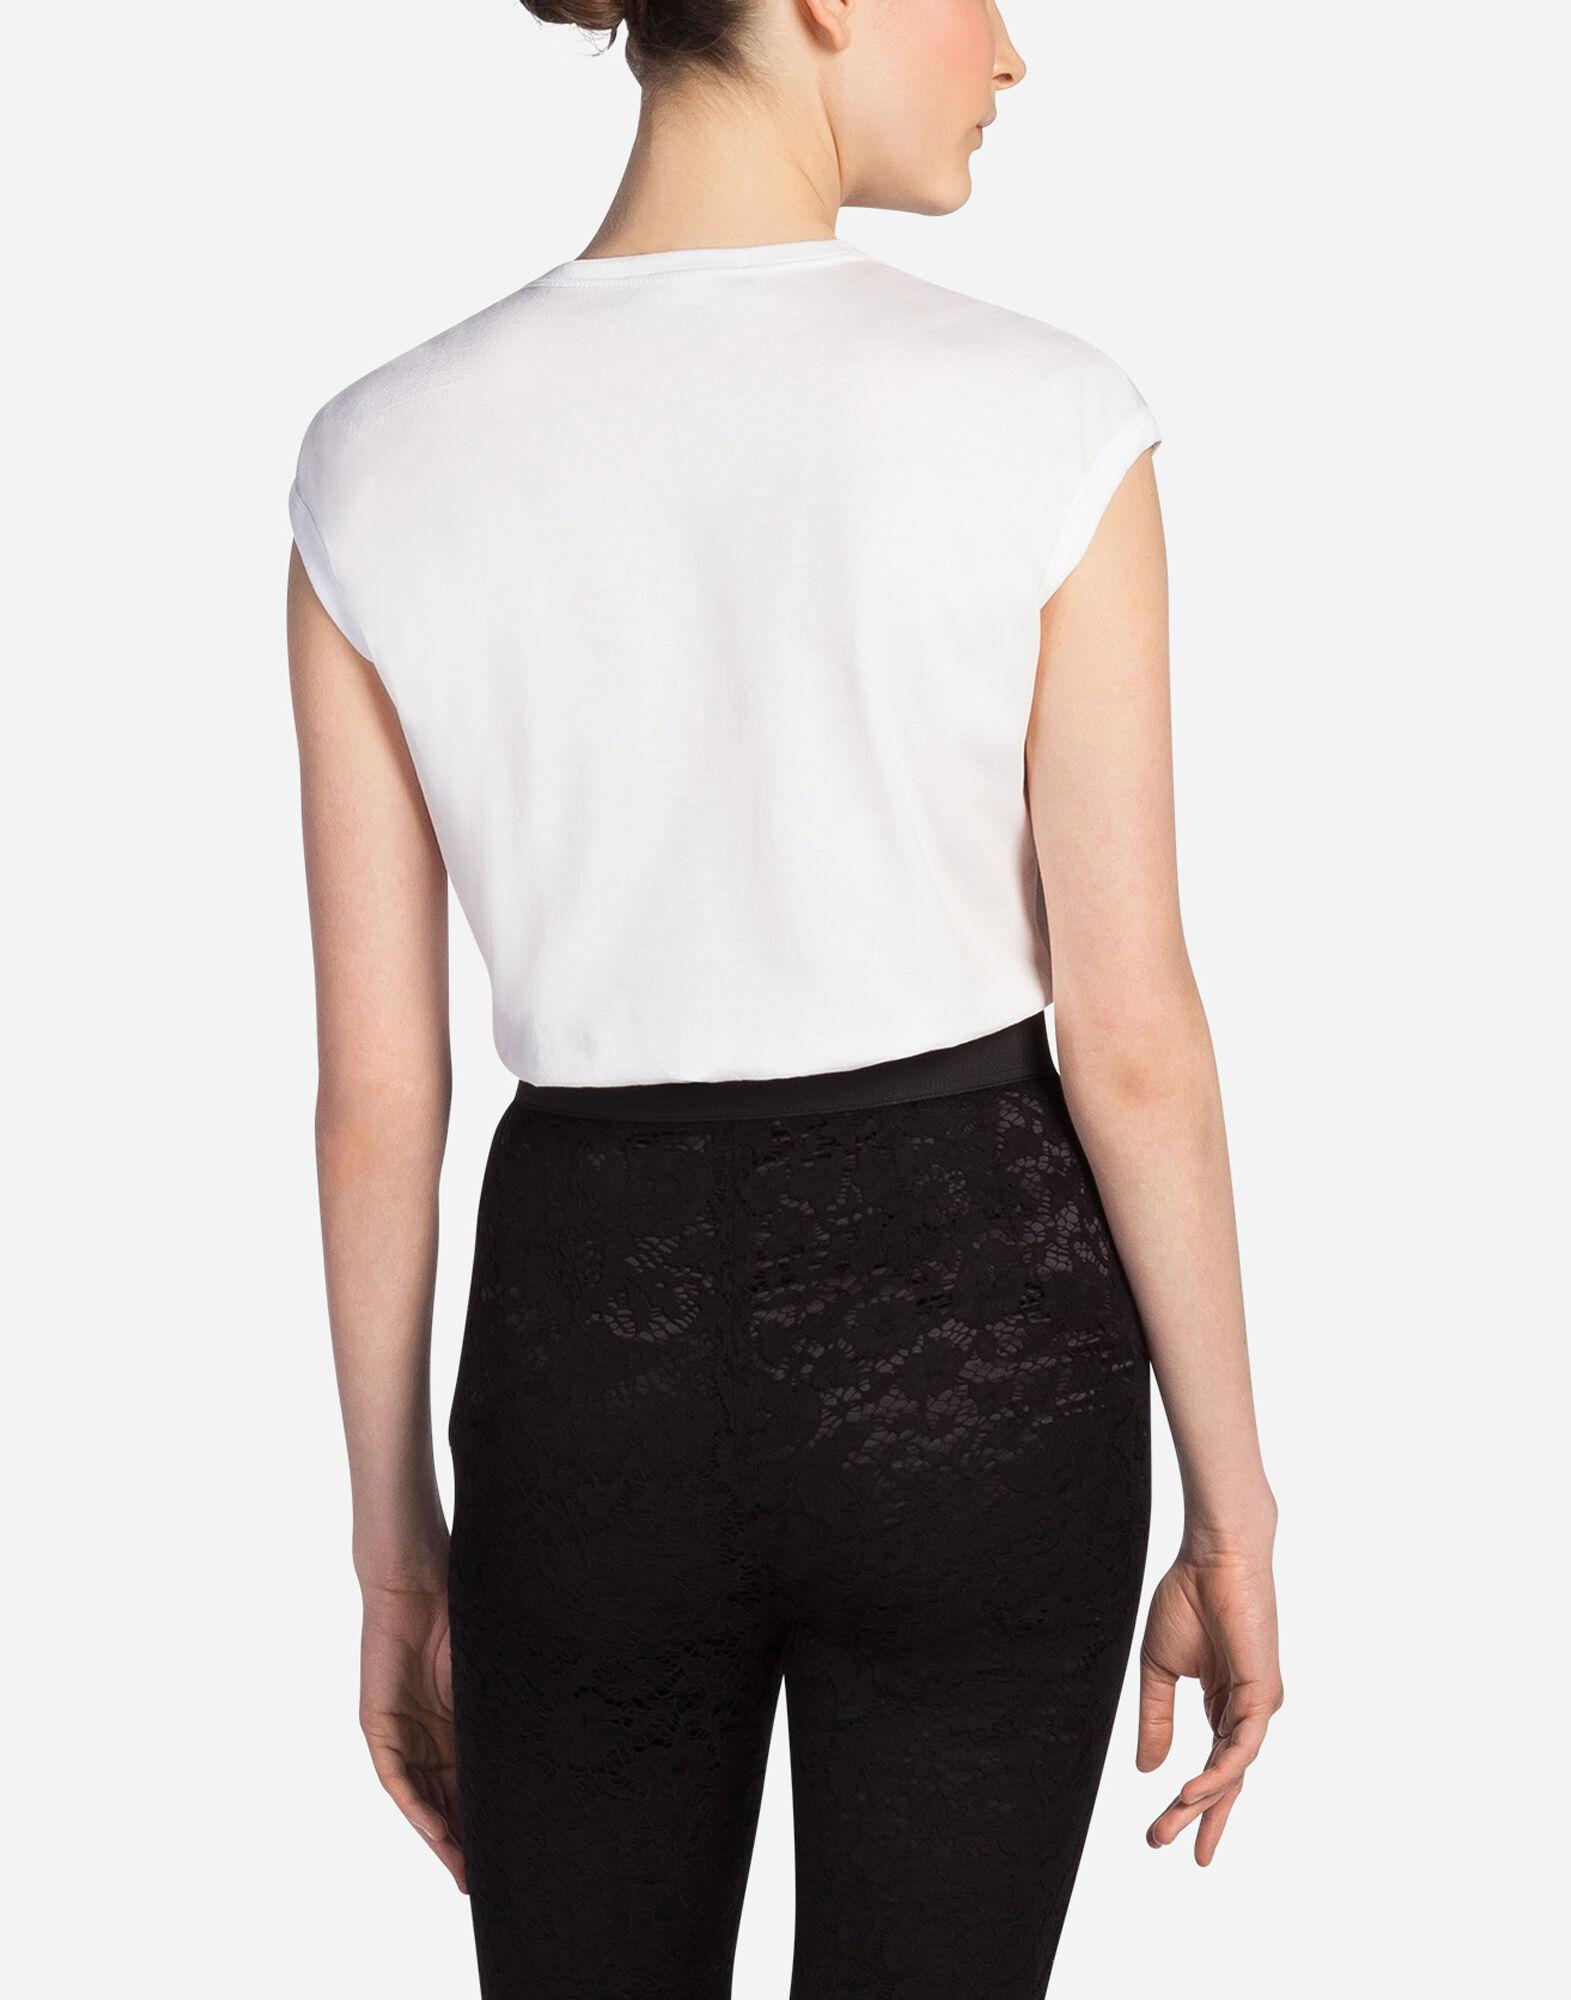 Women 39 s t shirts and sweatshirts dolce gabbana t shirt for Dolce and gabbana printed t shirts